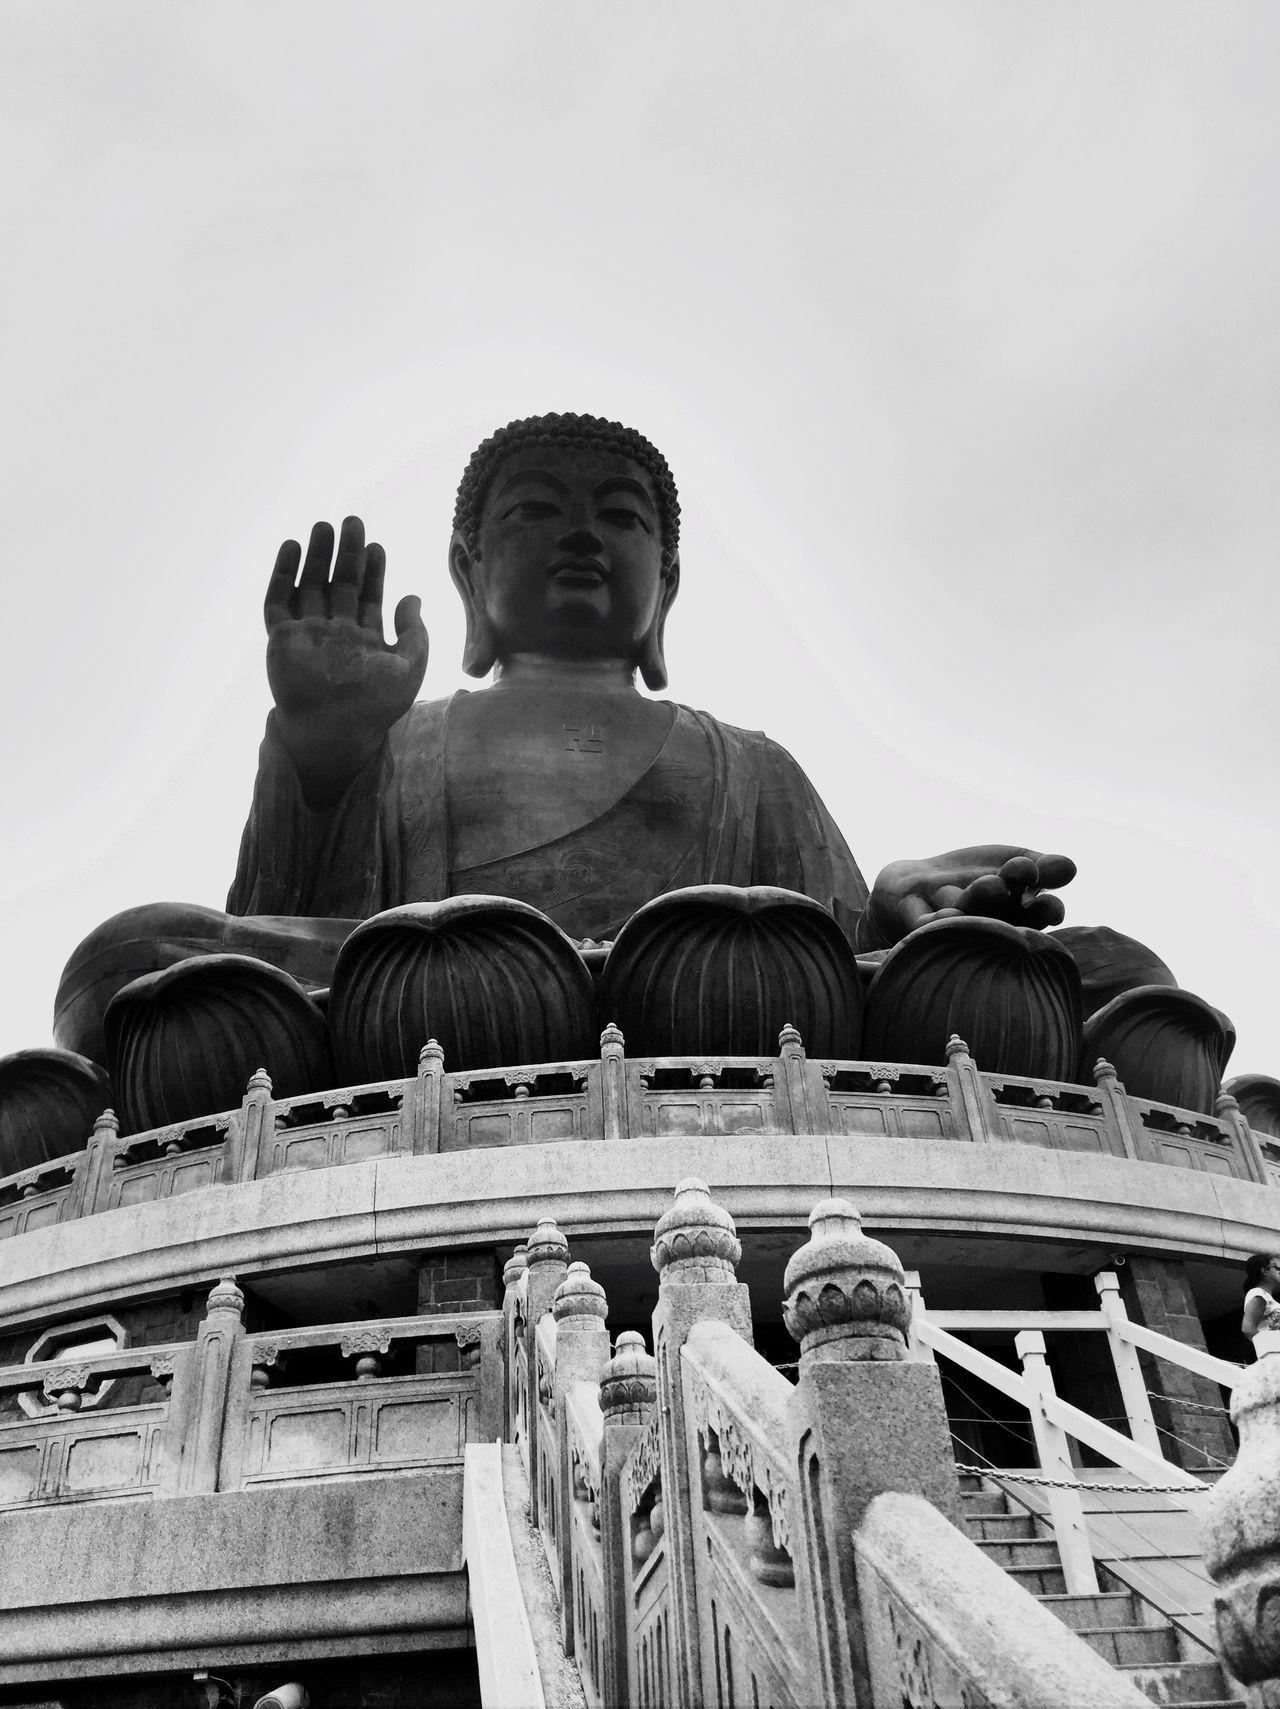 Statue Sculpture Buddha Buddhism Buddha Statue Spirituality Religion